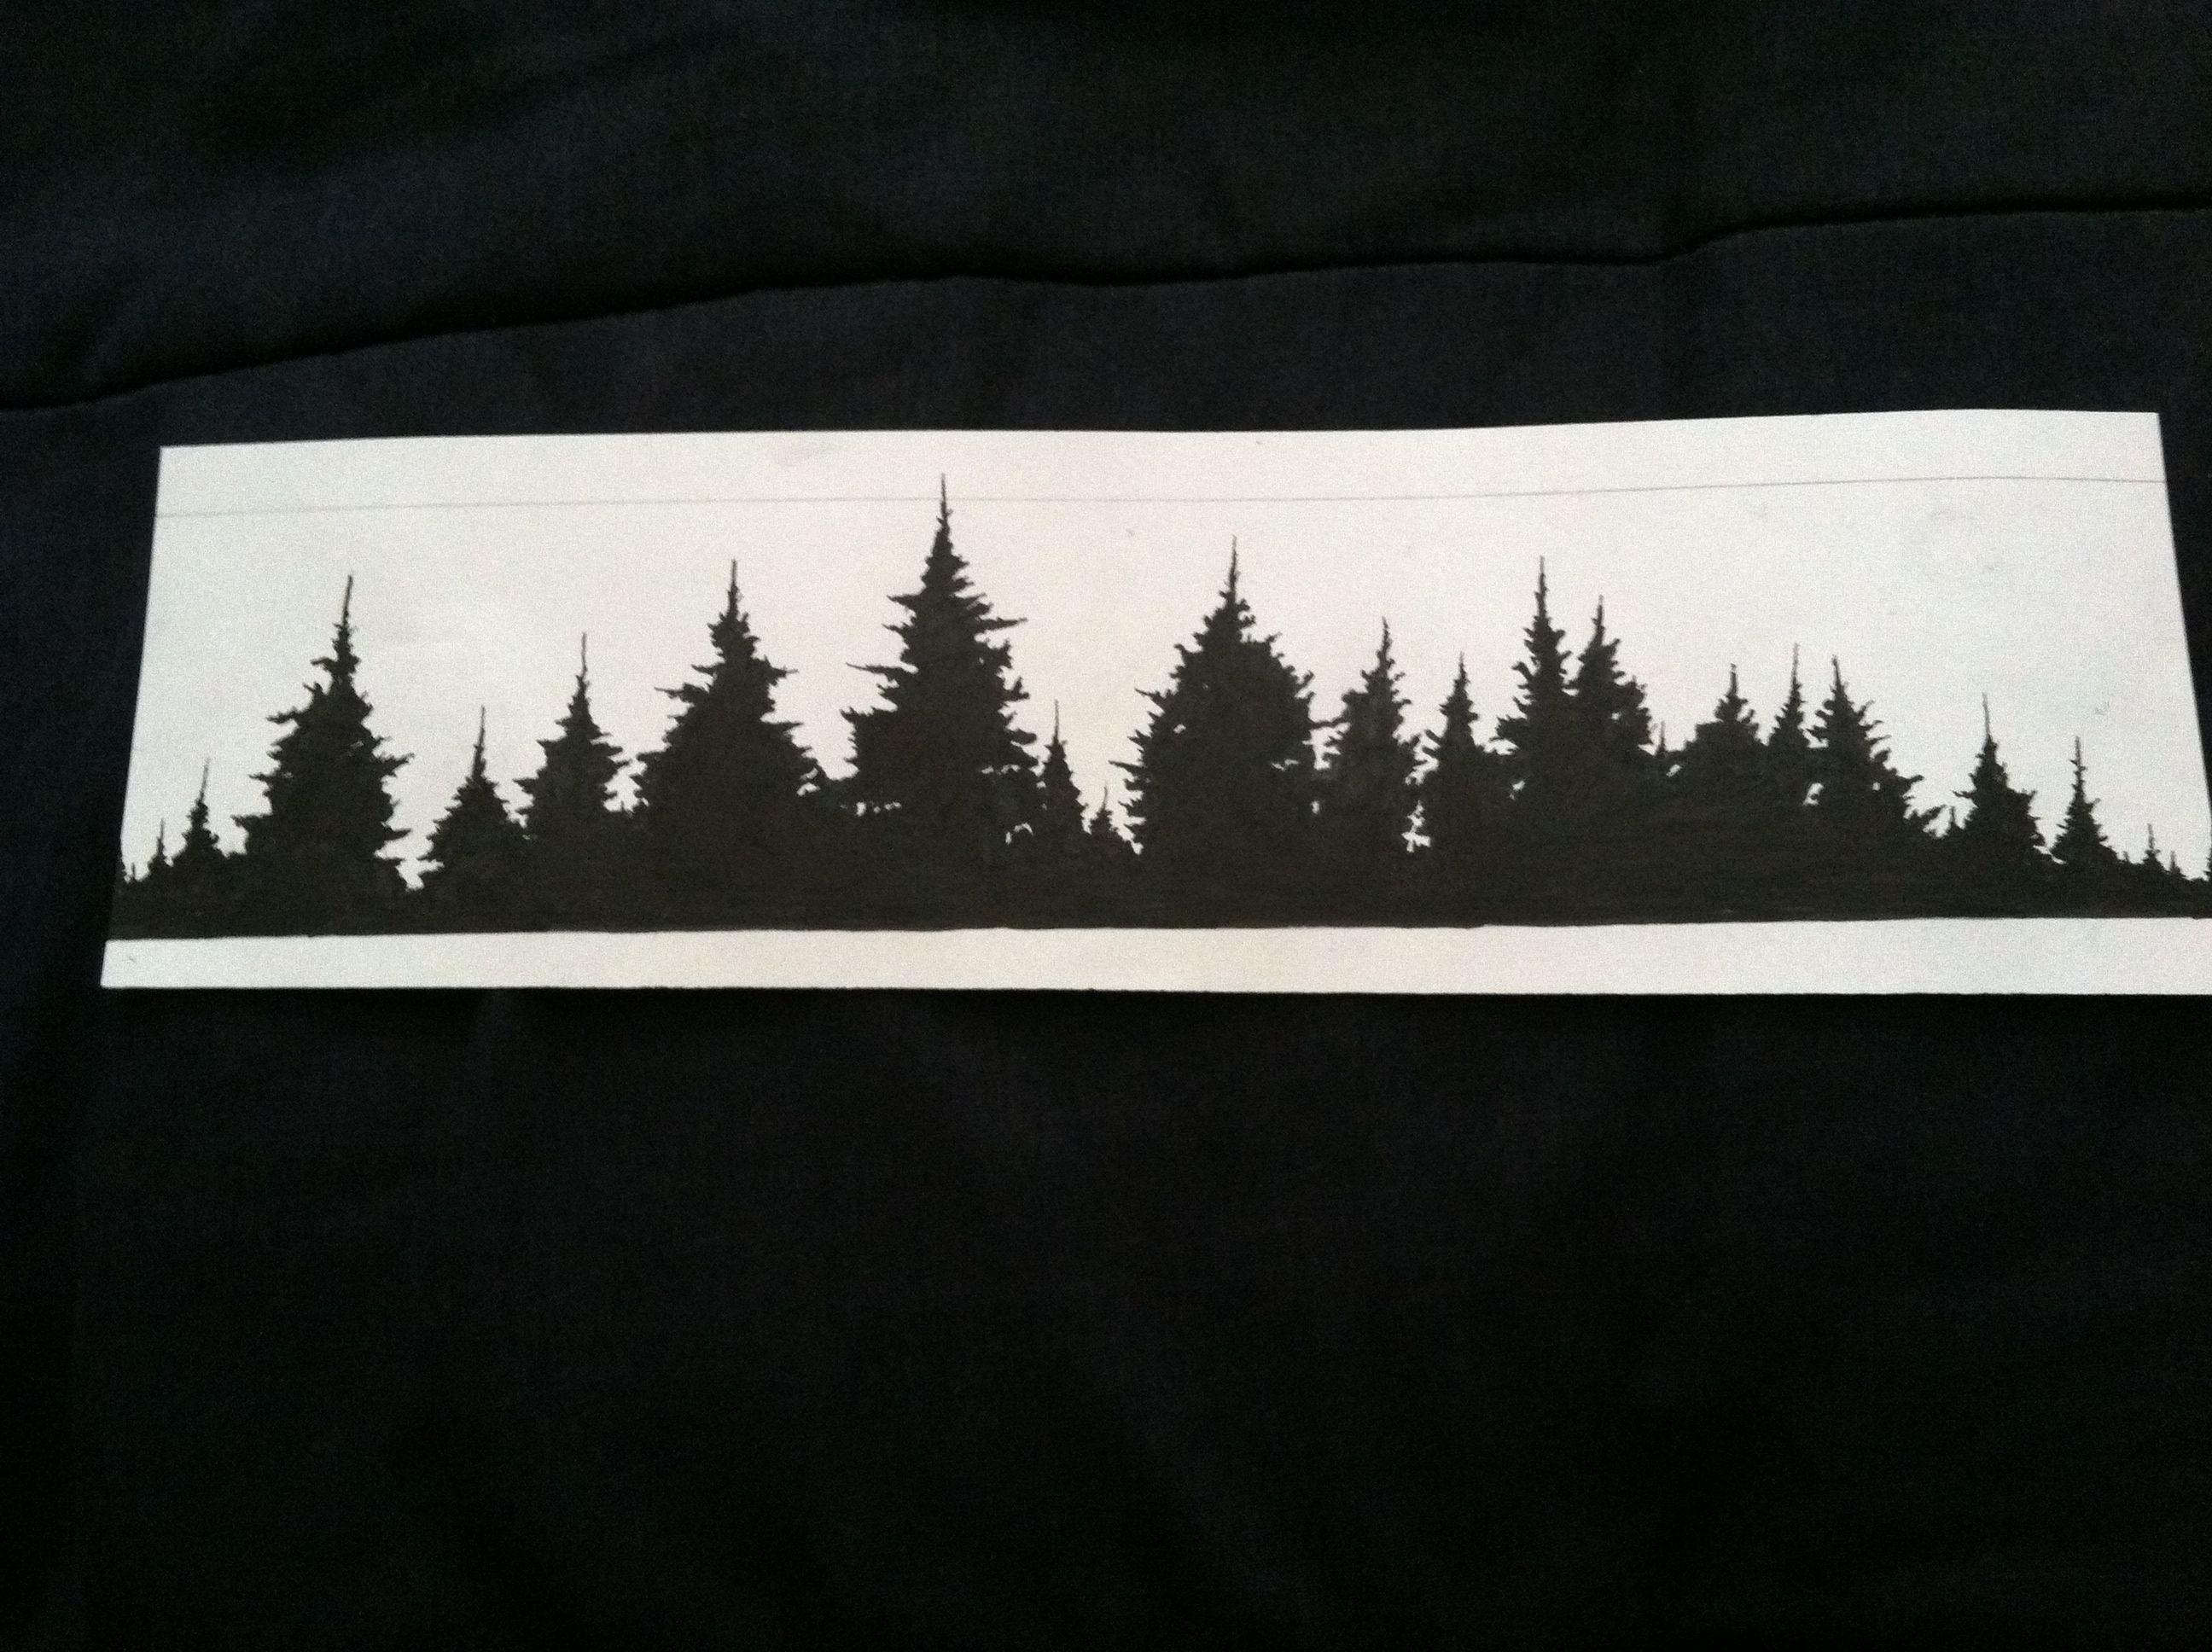 Forest treeline tattoo idea   Silhouette tattoos, Arm band ...